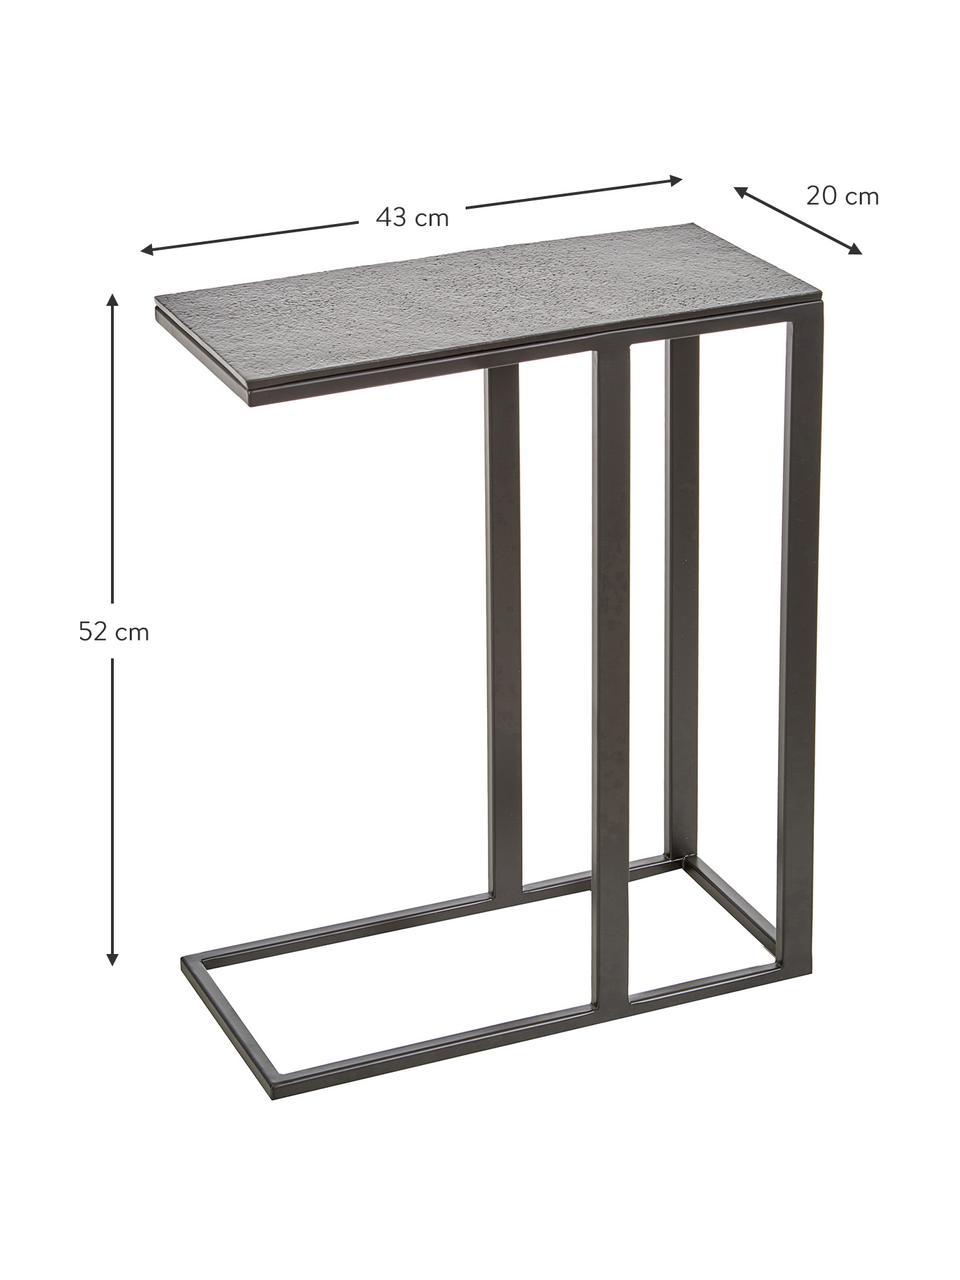 Beistelltisch Edge im Industrial Design, Tischplatte: Metall, beschichtet, Gestell: Metall, pulverbeschichtet, Tischplatte: Schwarz Gestell: Schwarz, matt, 45 x 62 cm